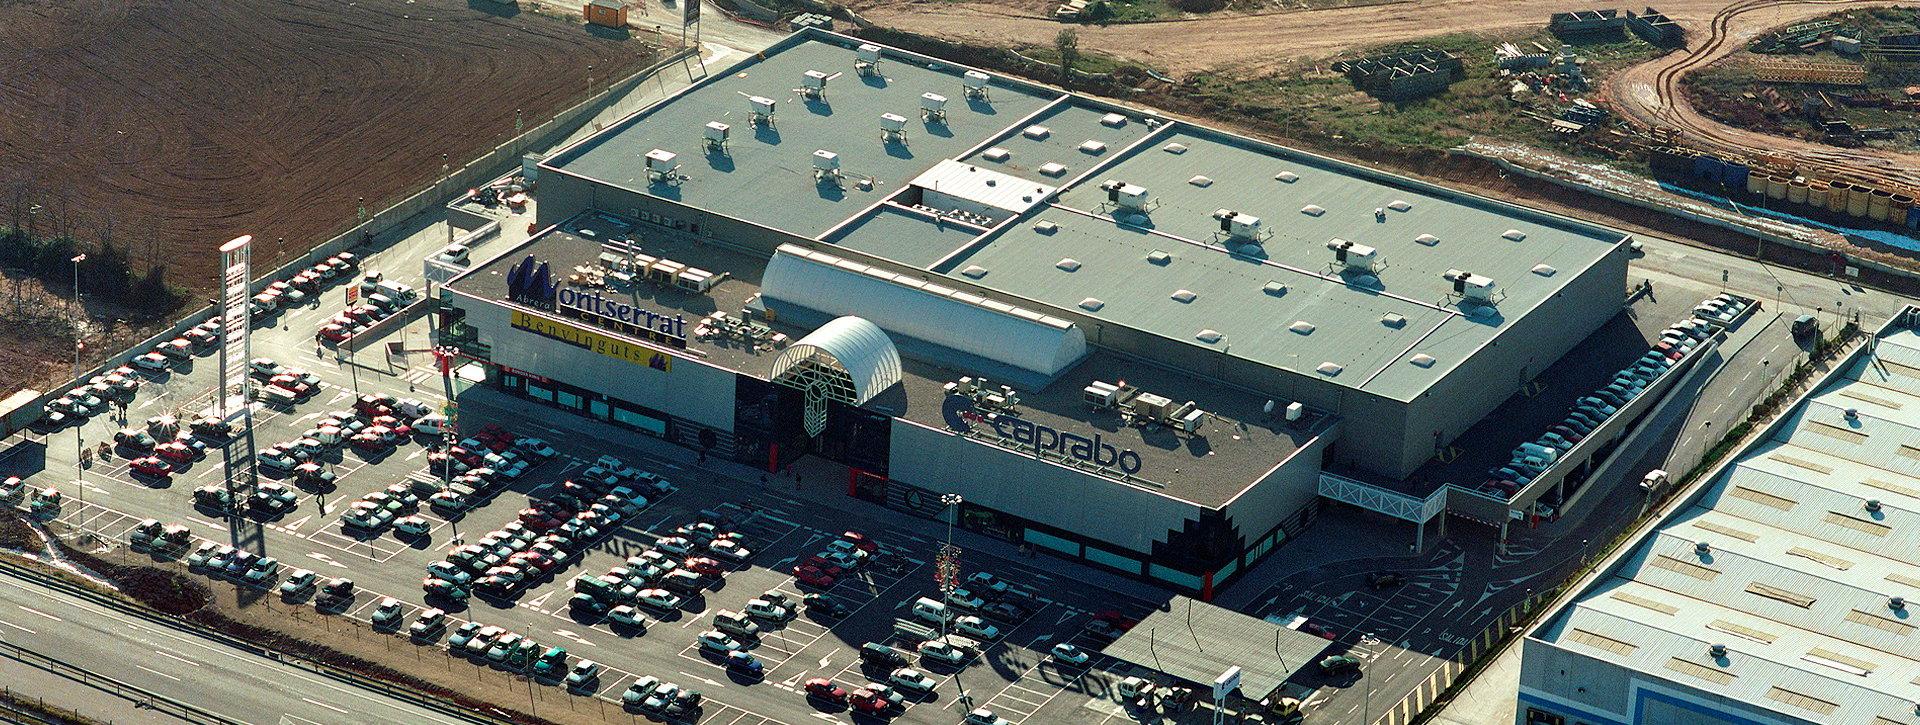 Centre comercial abrera centre (1)